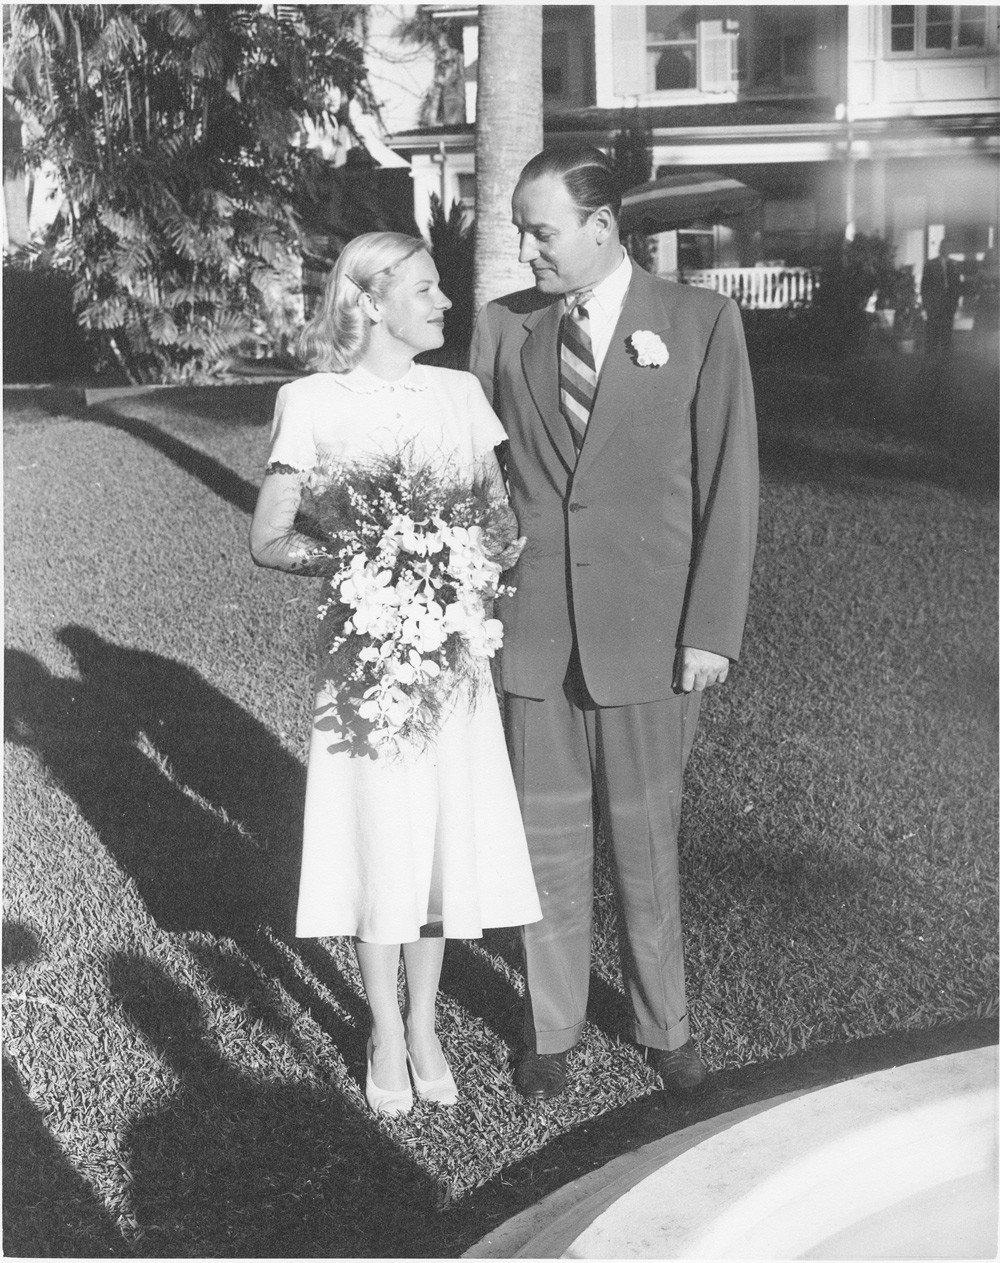 The life of Winthrop Rockefeller - Arkansas Times